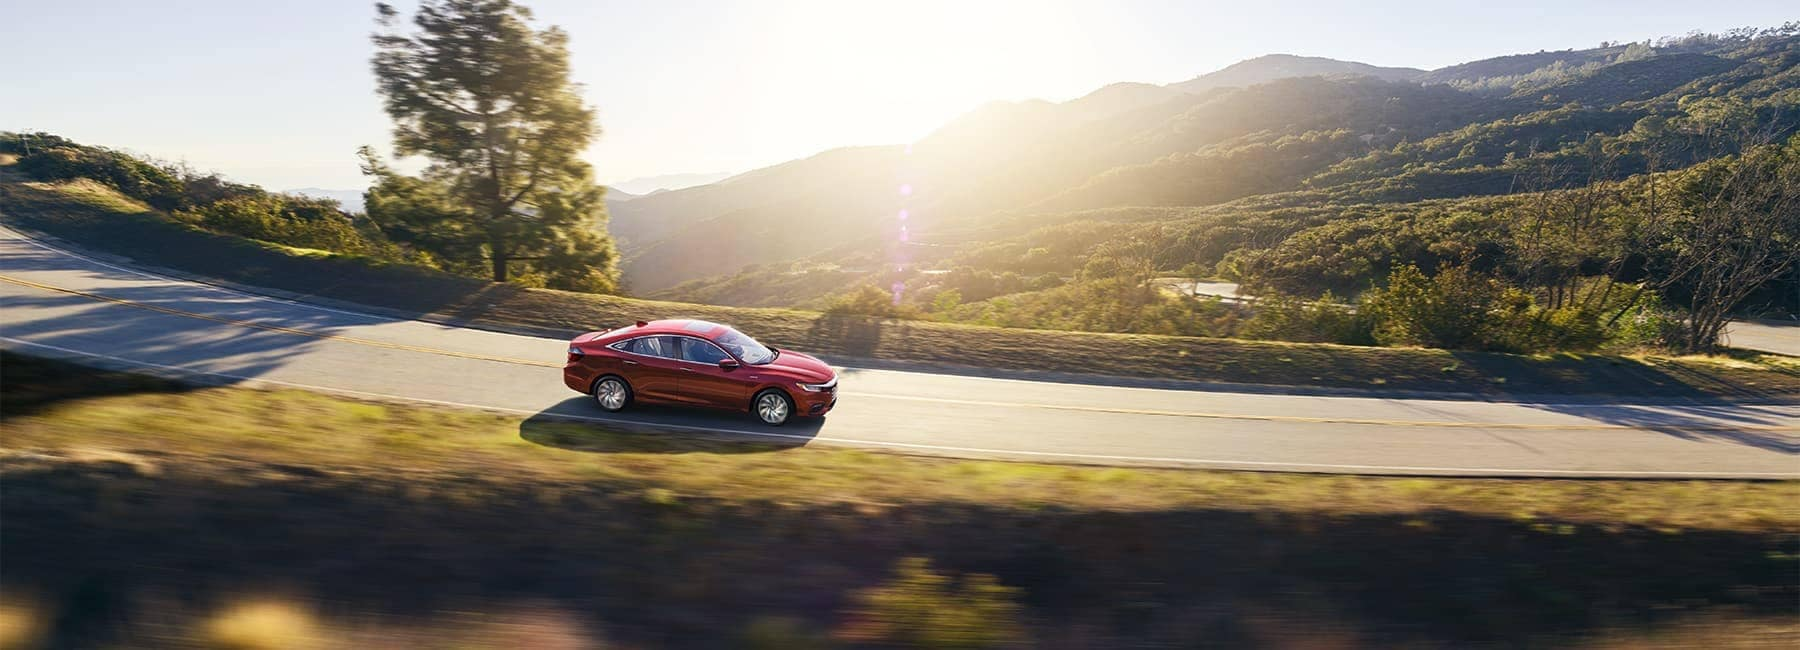 Honda Insight driving through countryside